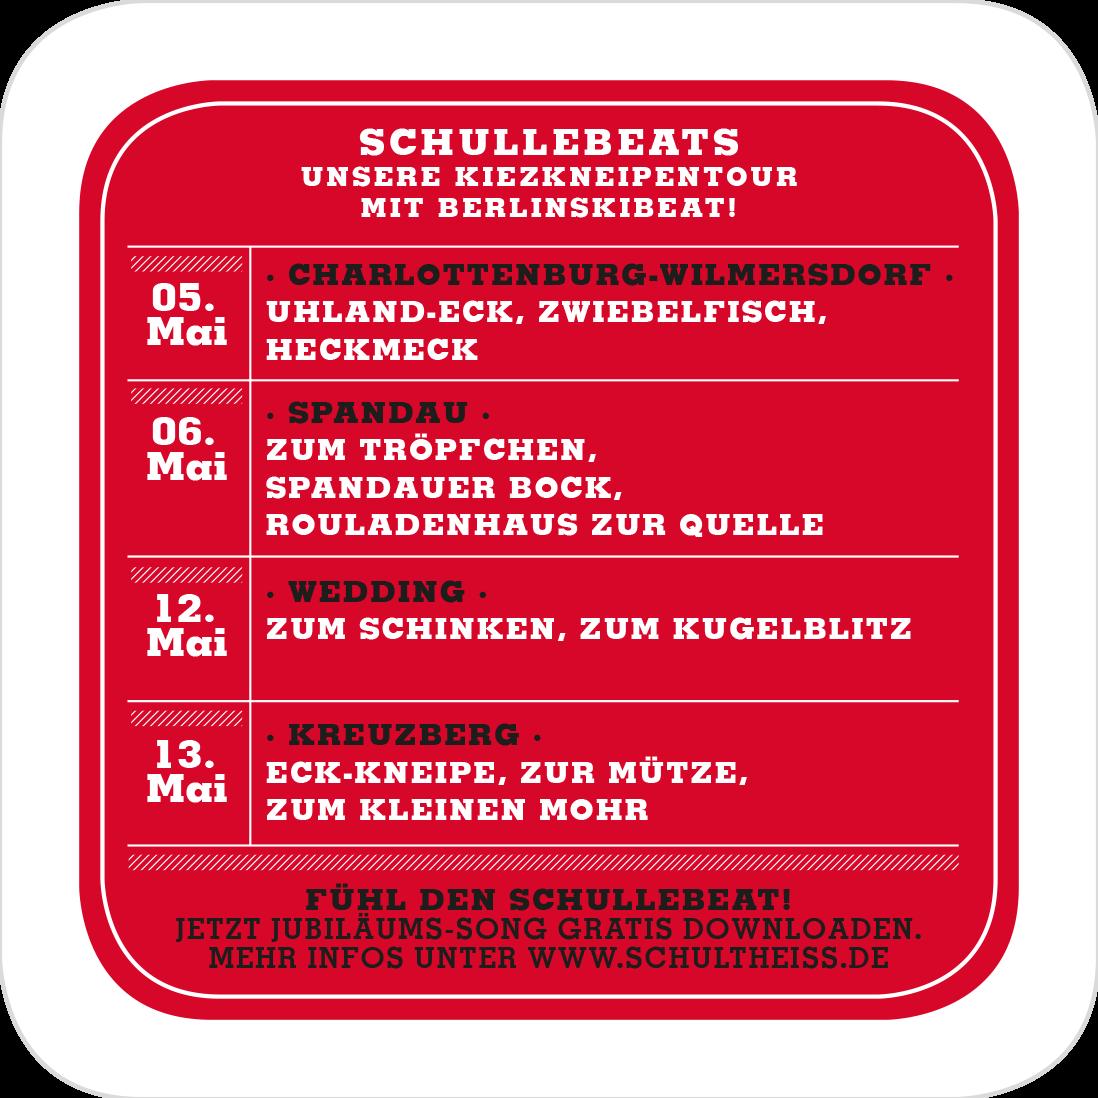 Schultheiss_Bierdeckel_170321-2.png